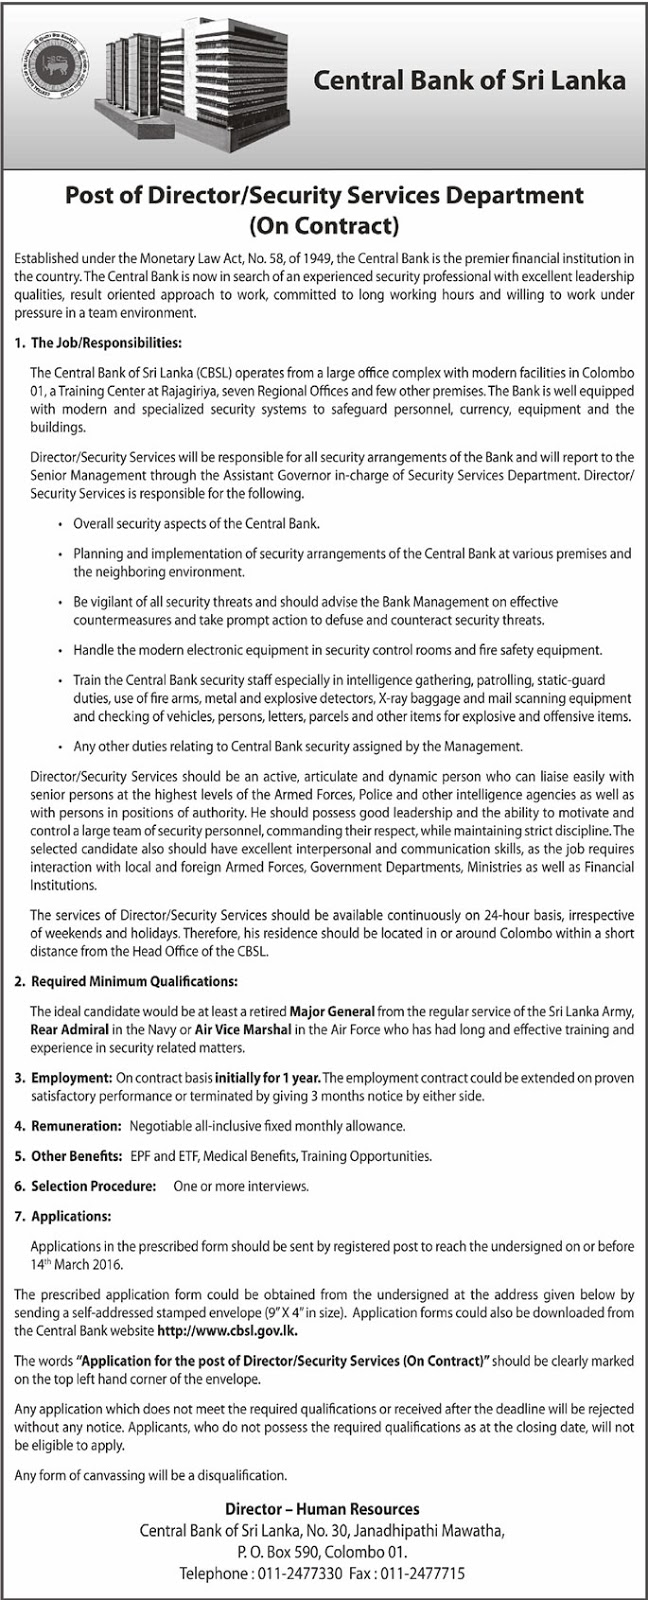 Vacancies - Director (Security Services Department)